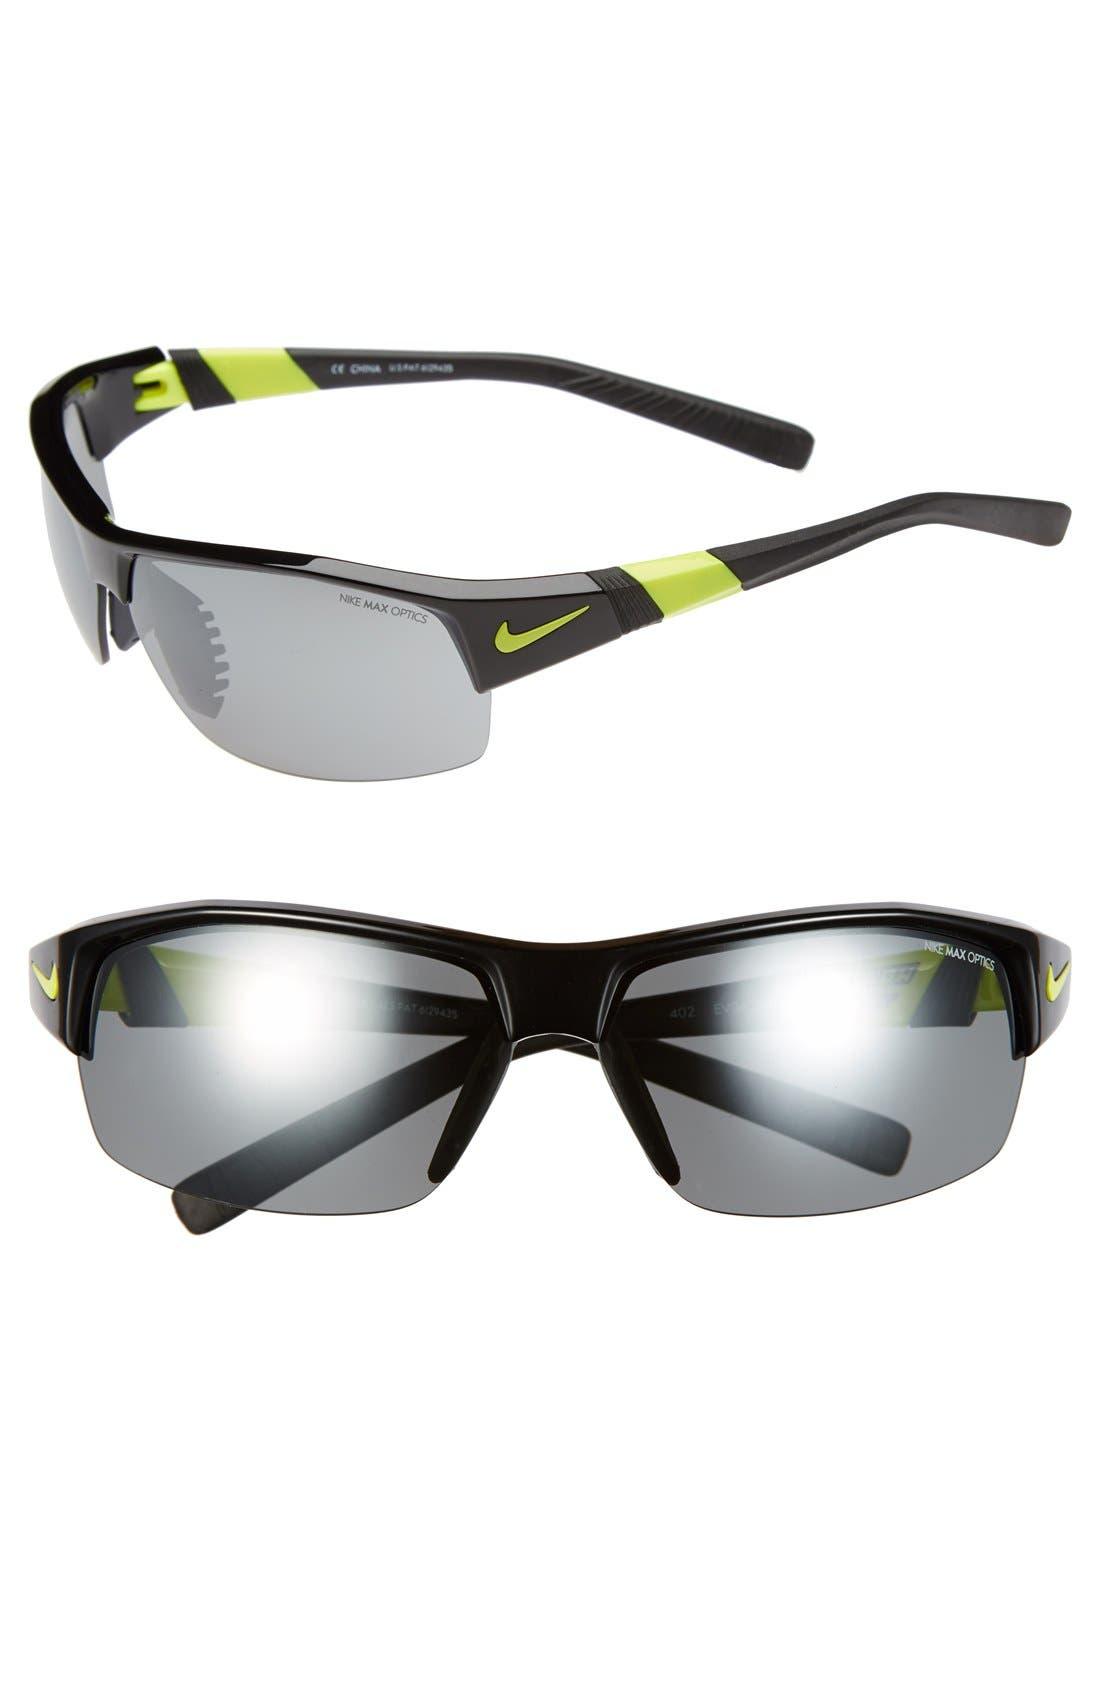 NIKE Show X2 Semi Rimless 69mm Sunglasses